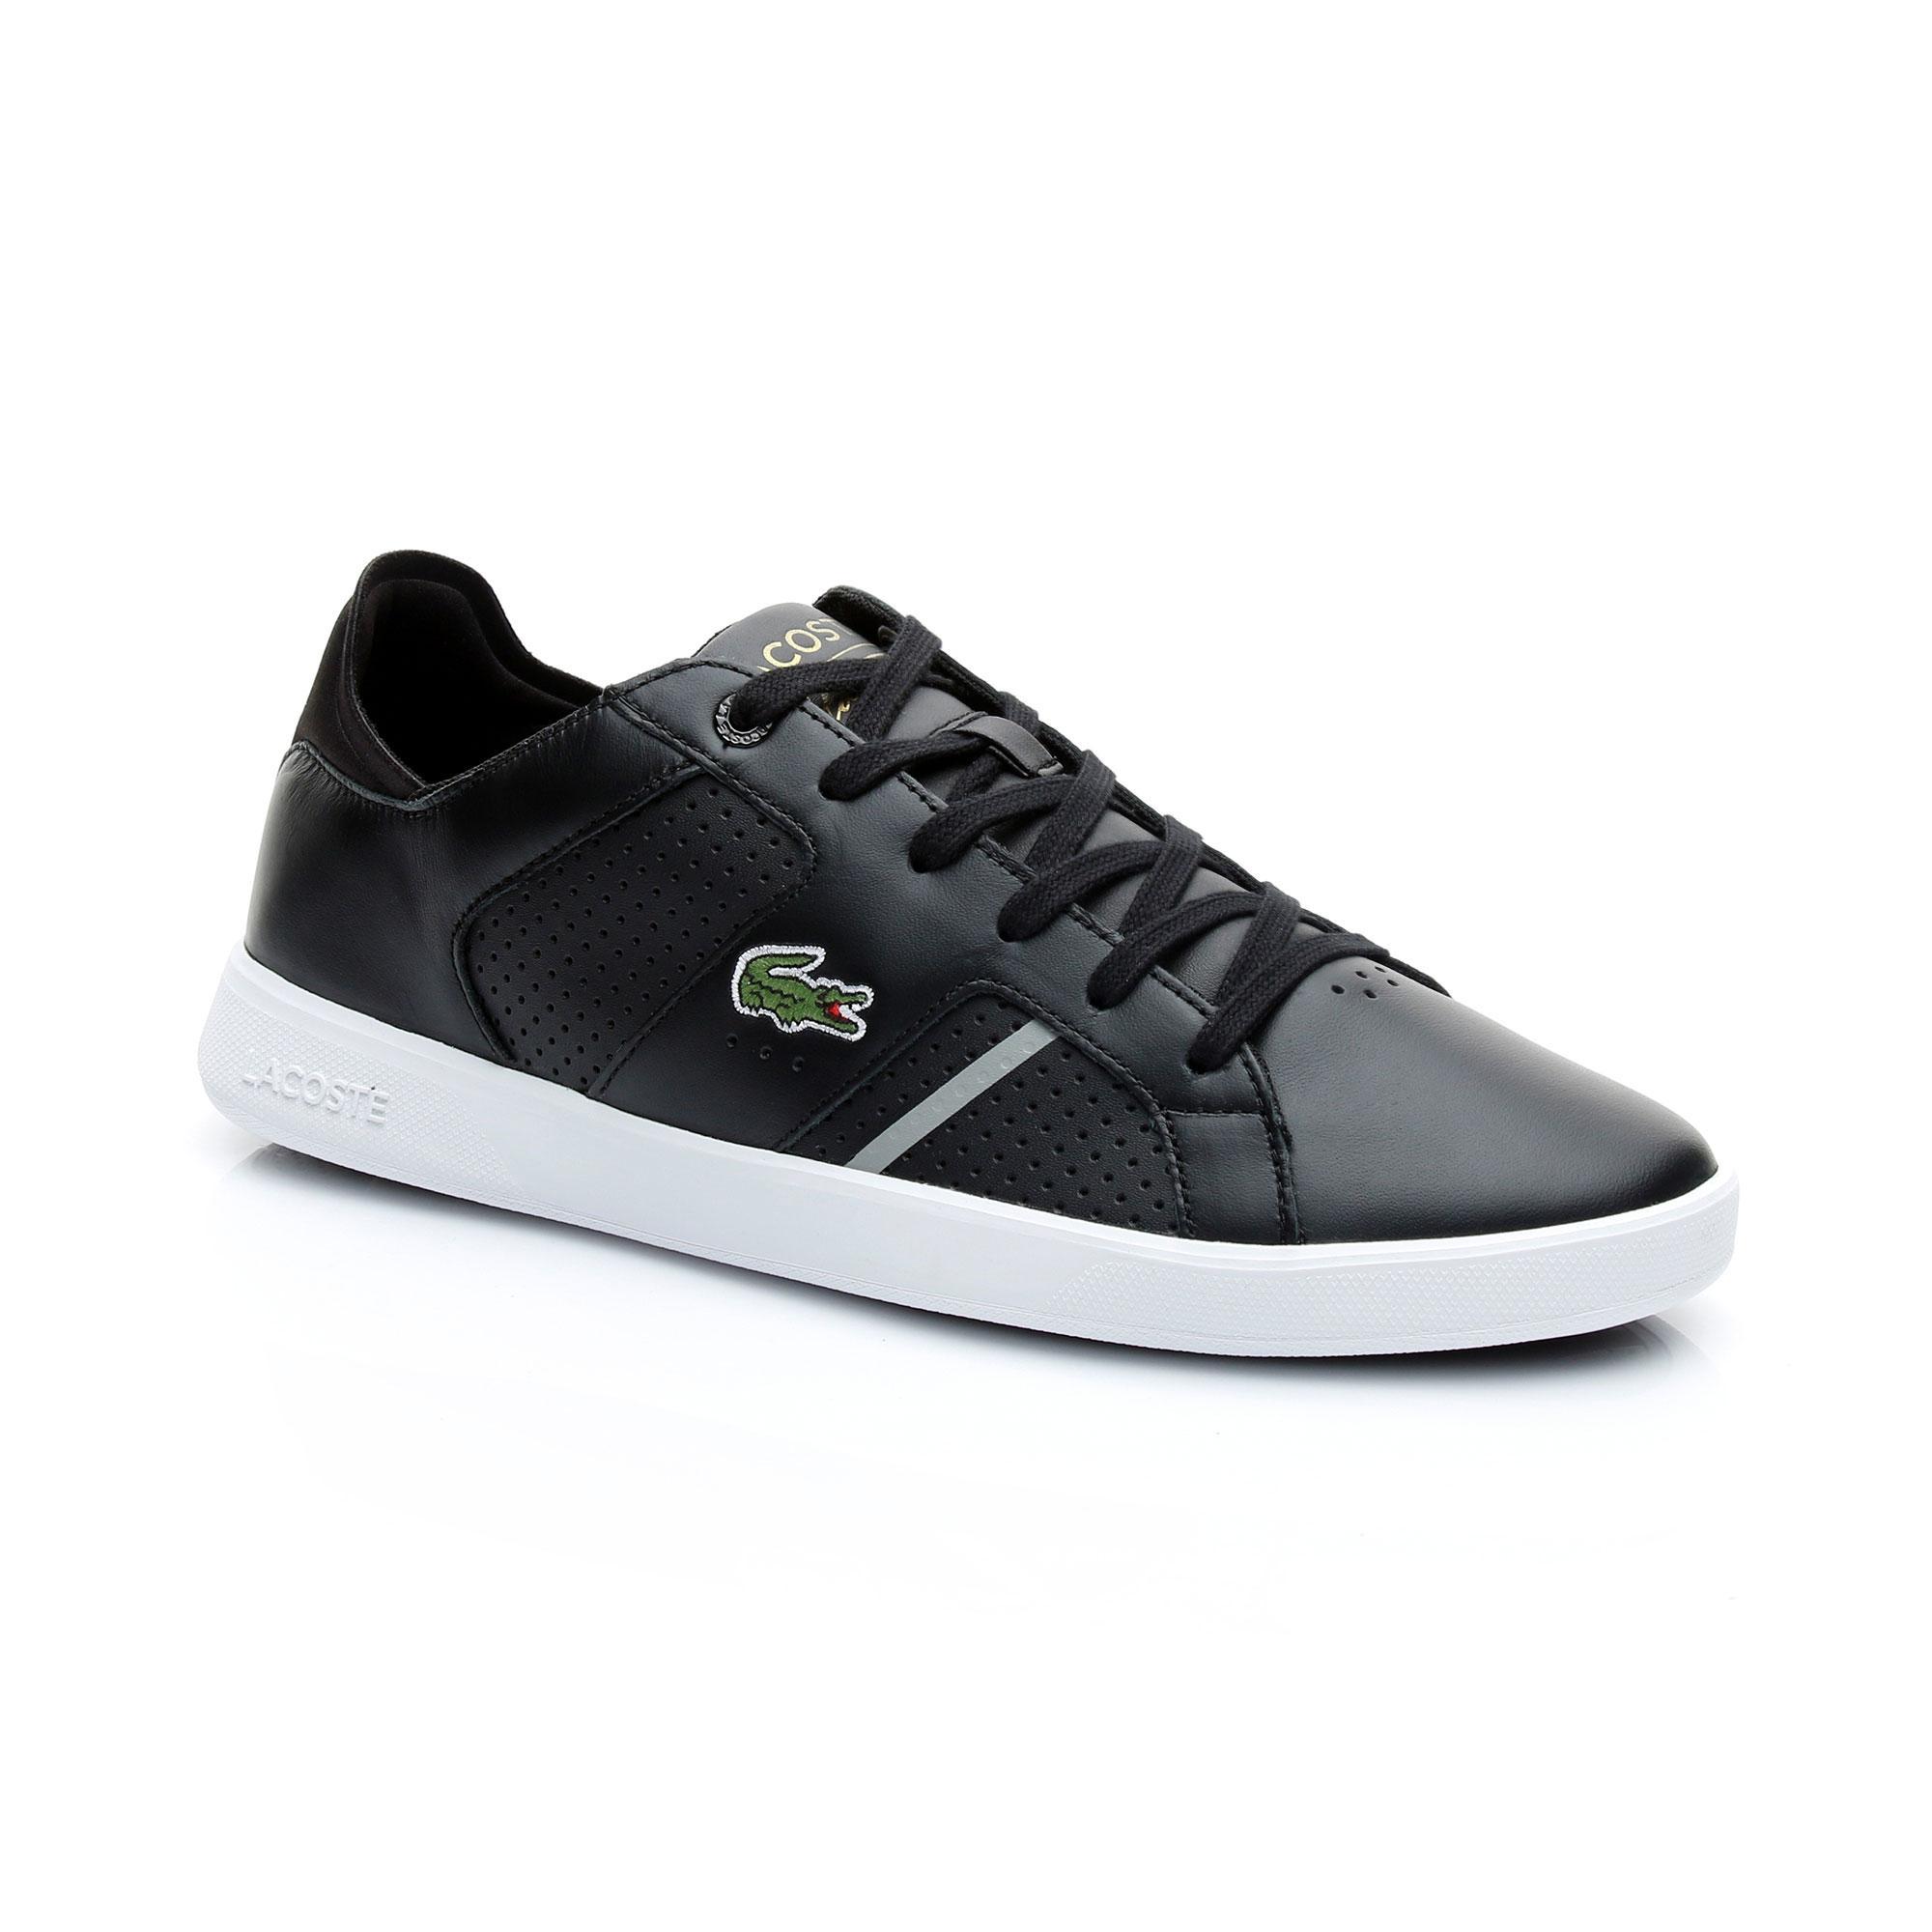 Lacoste Erkek Novas Ct 118 1 Siyah Sneaker